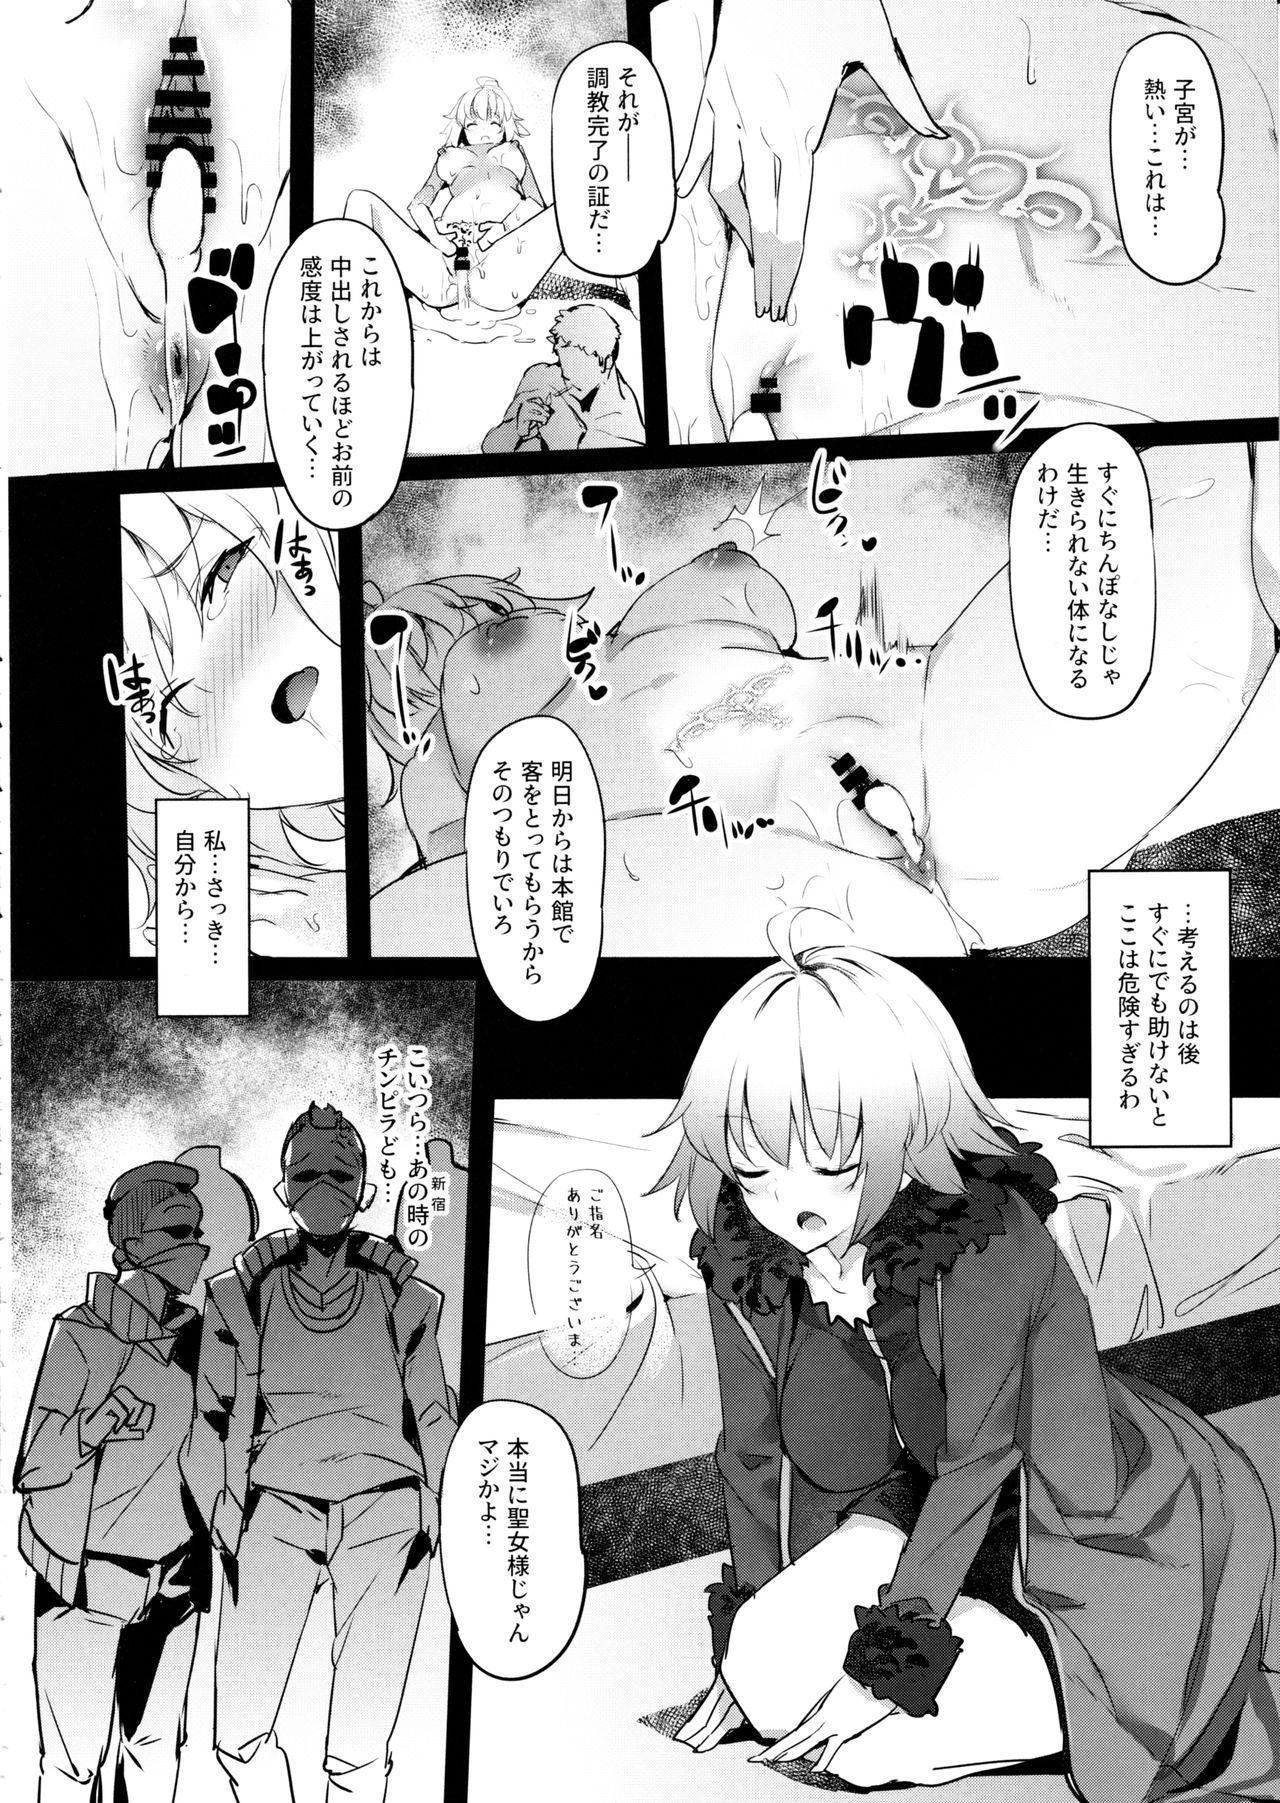 Mesubuta Avenger Jeanne d'Arc alter Choukyou Nikki 12